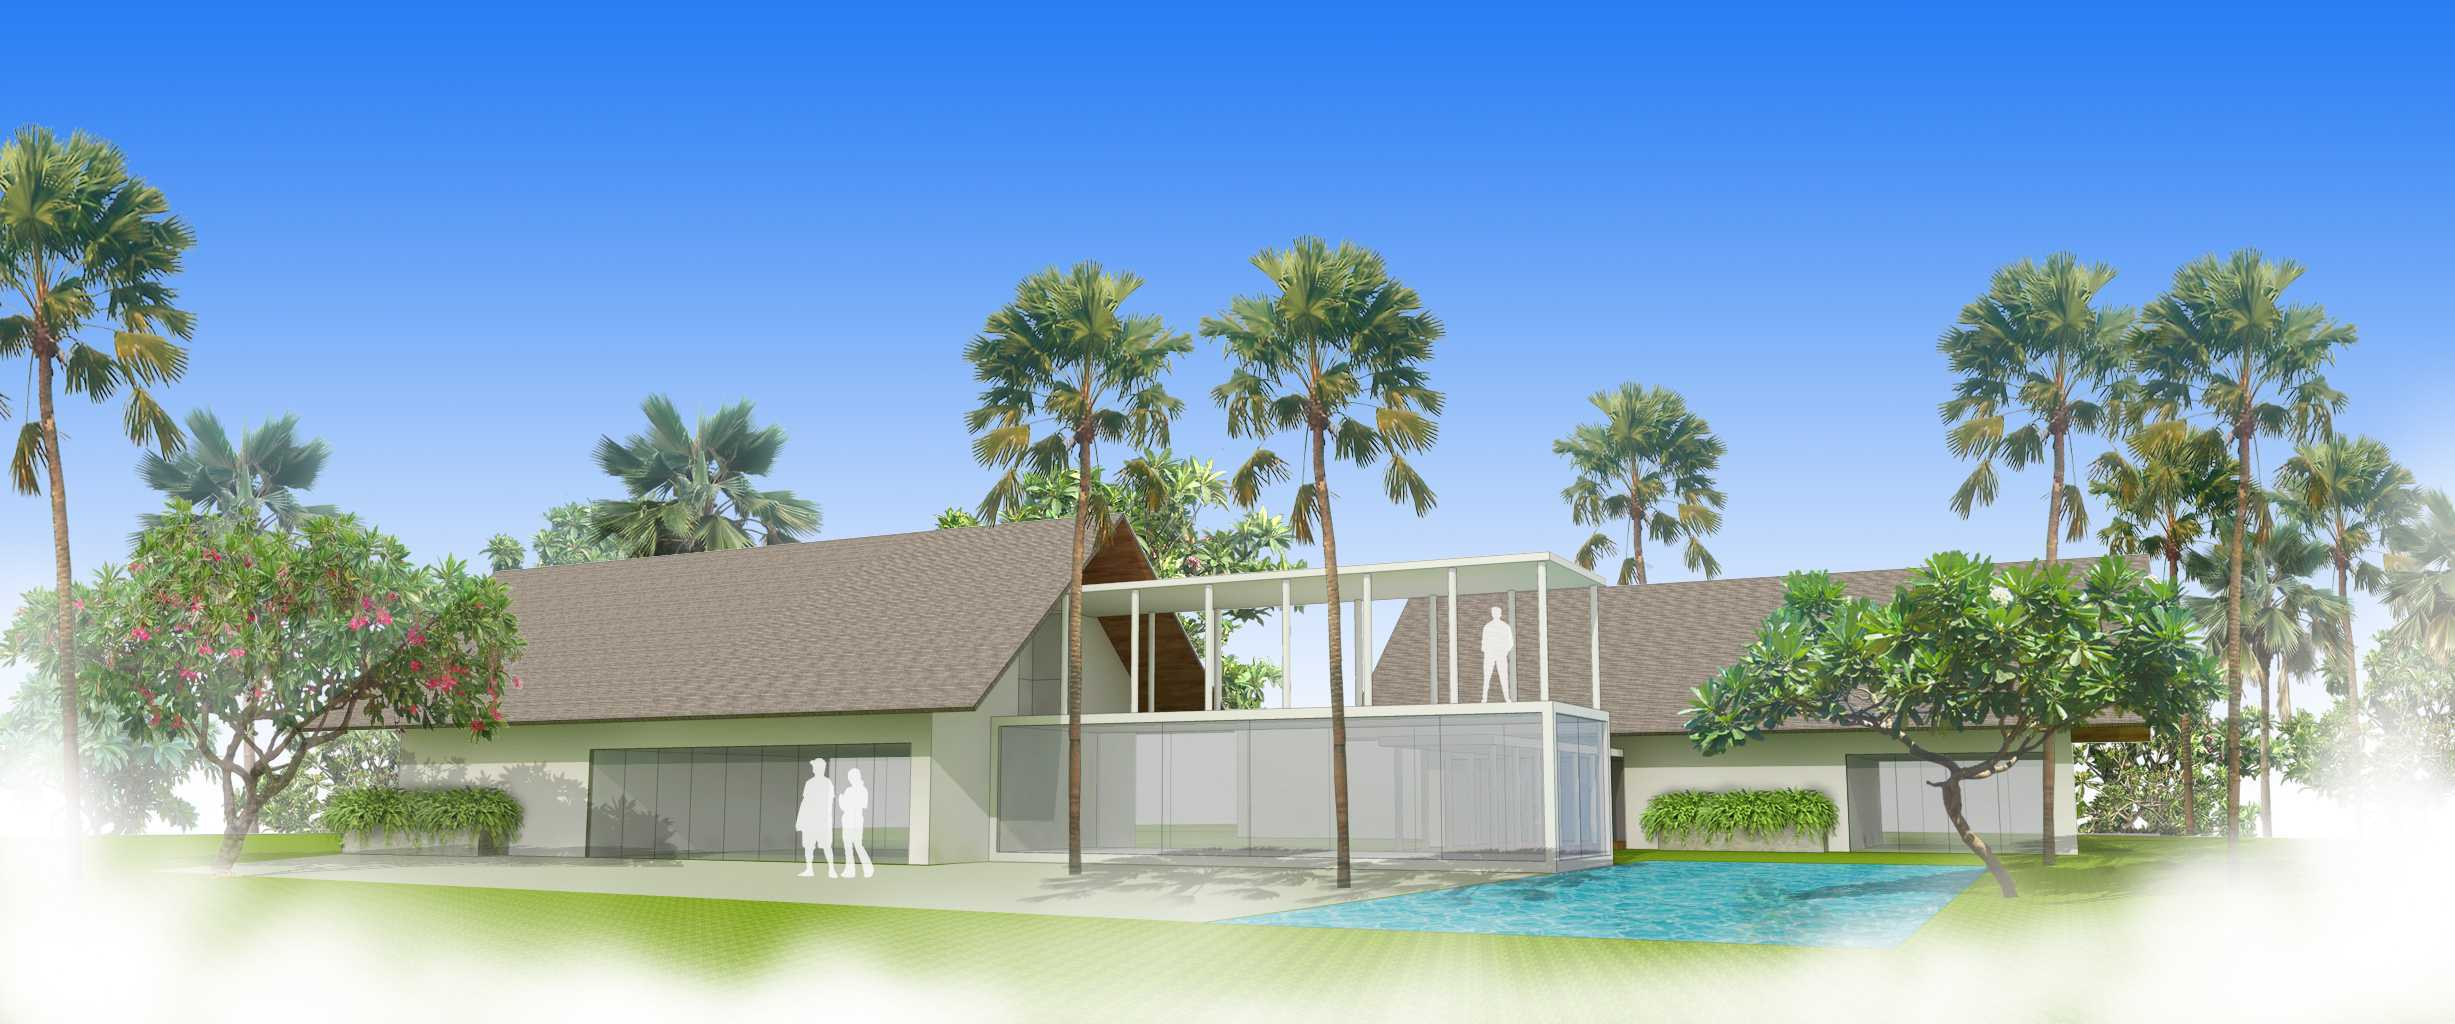 Rerupa Architecture Oefafi Resort & Resto Oefafi, Nusa Tenggara Timur, Indonesia Oefafi, Nusa Tenggara Timur, Indonesia Restaurant   28979